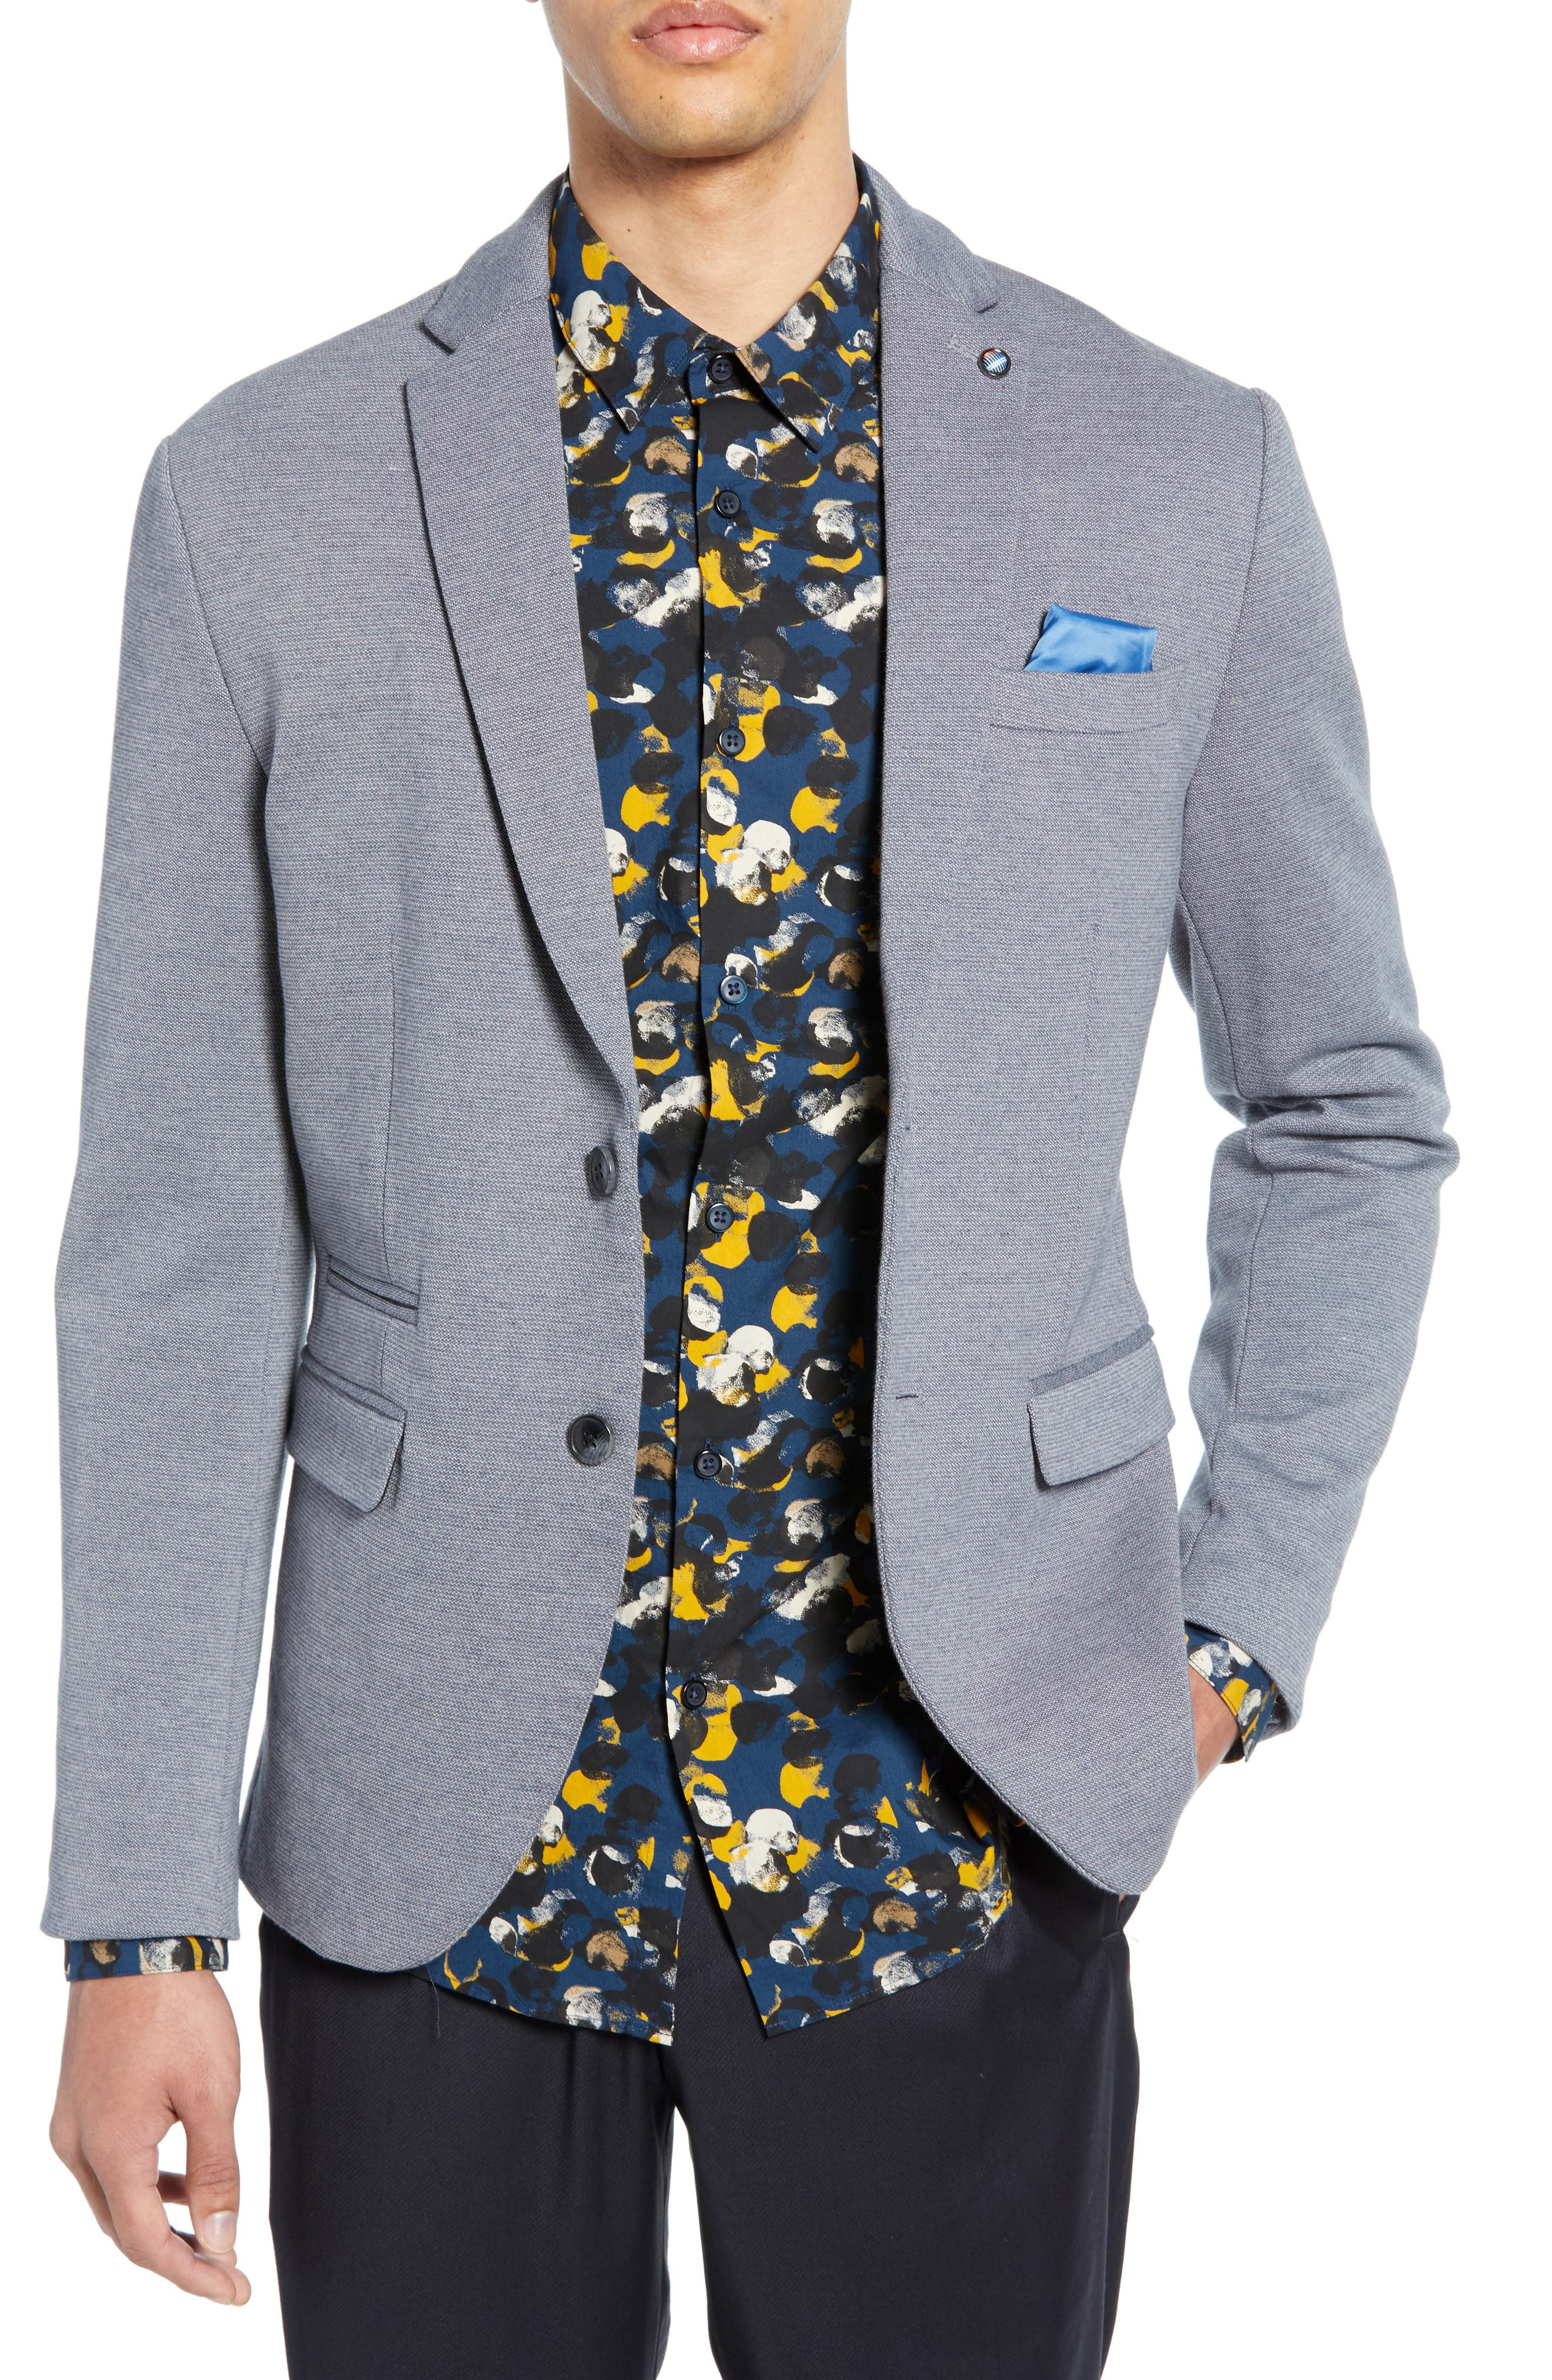 SELECTED HOMME, Slim Fit Sport Coat, Main thumbnail 1, color, GREY MELANGE